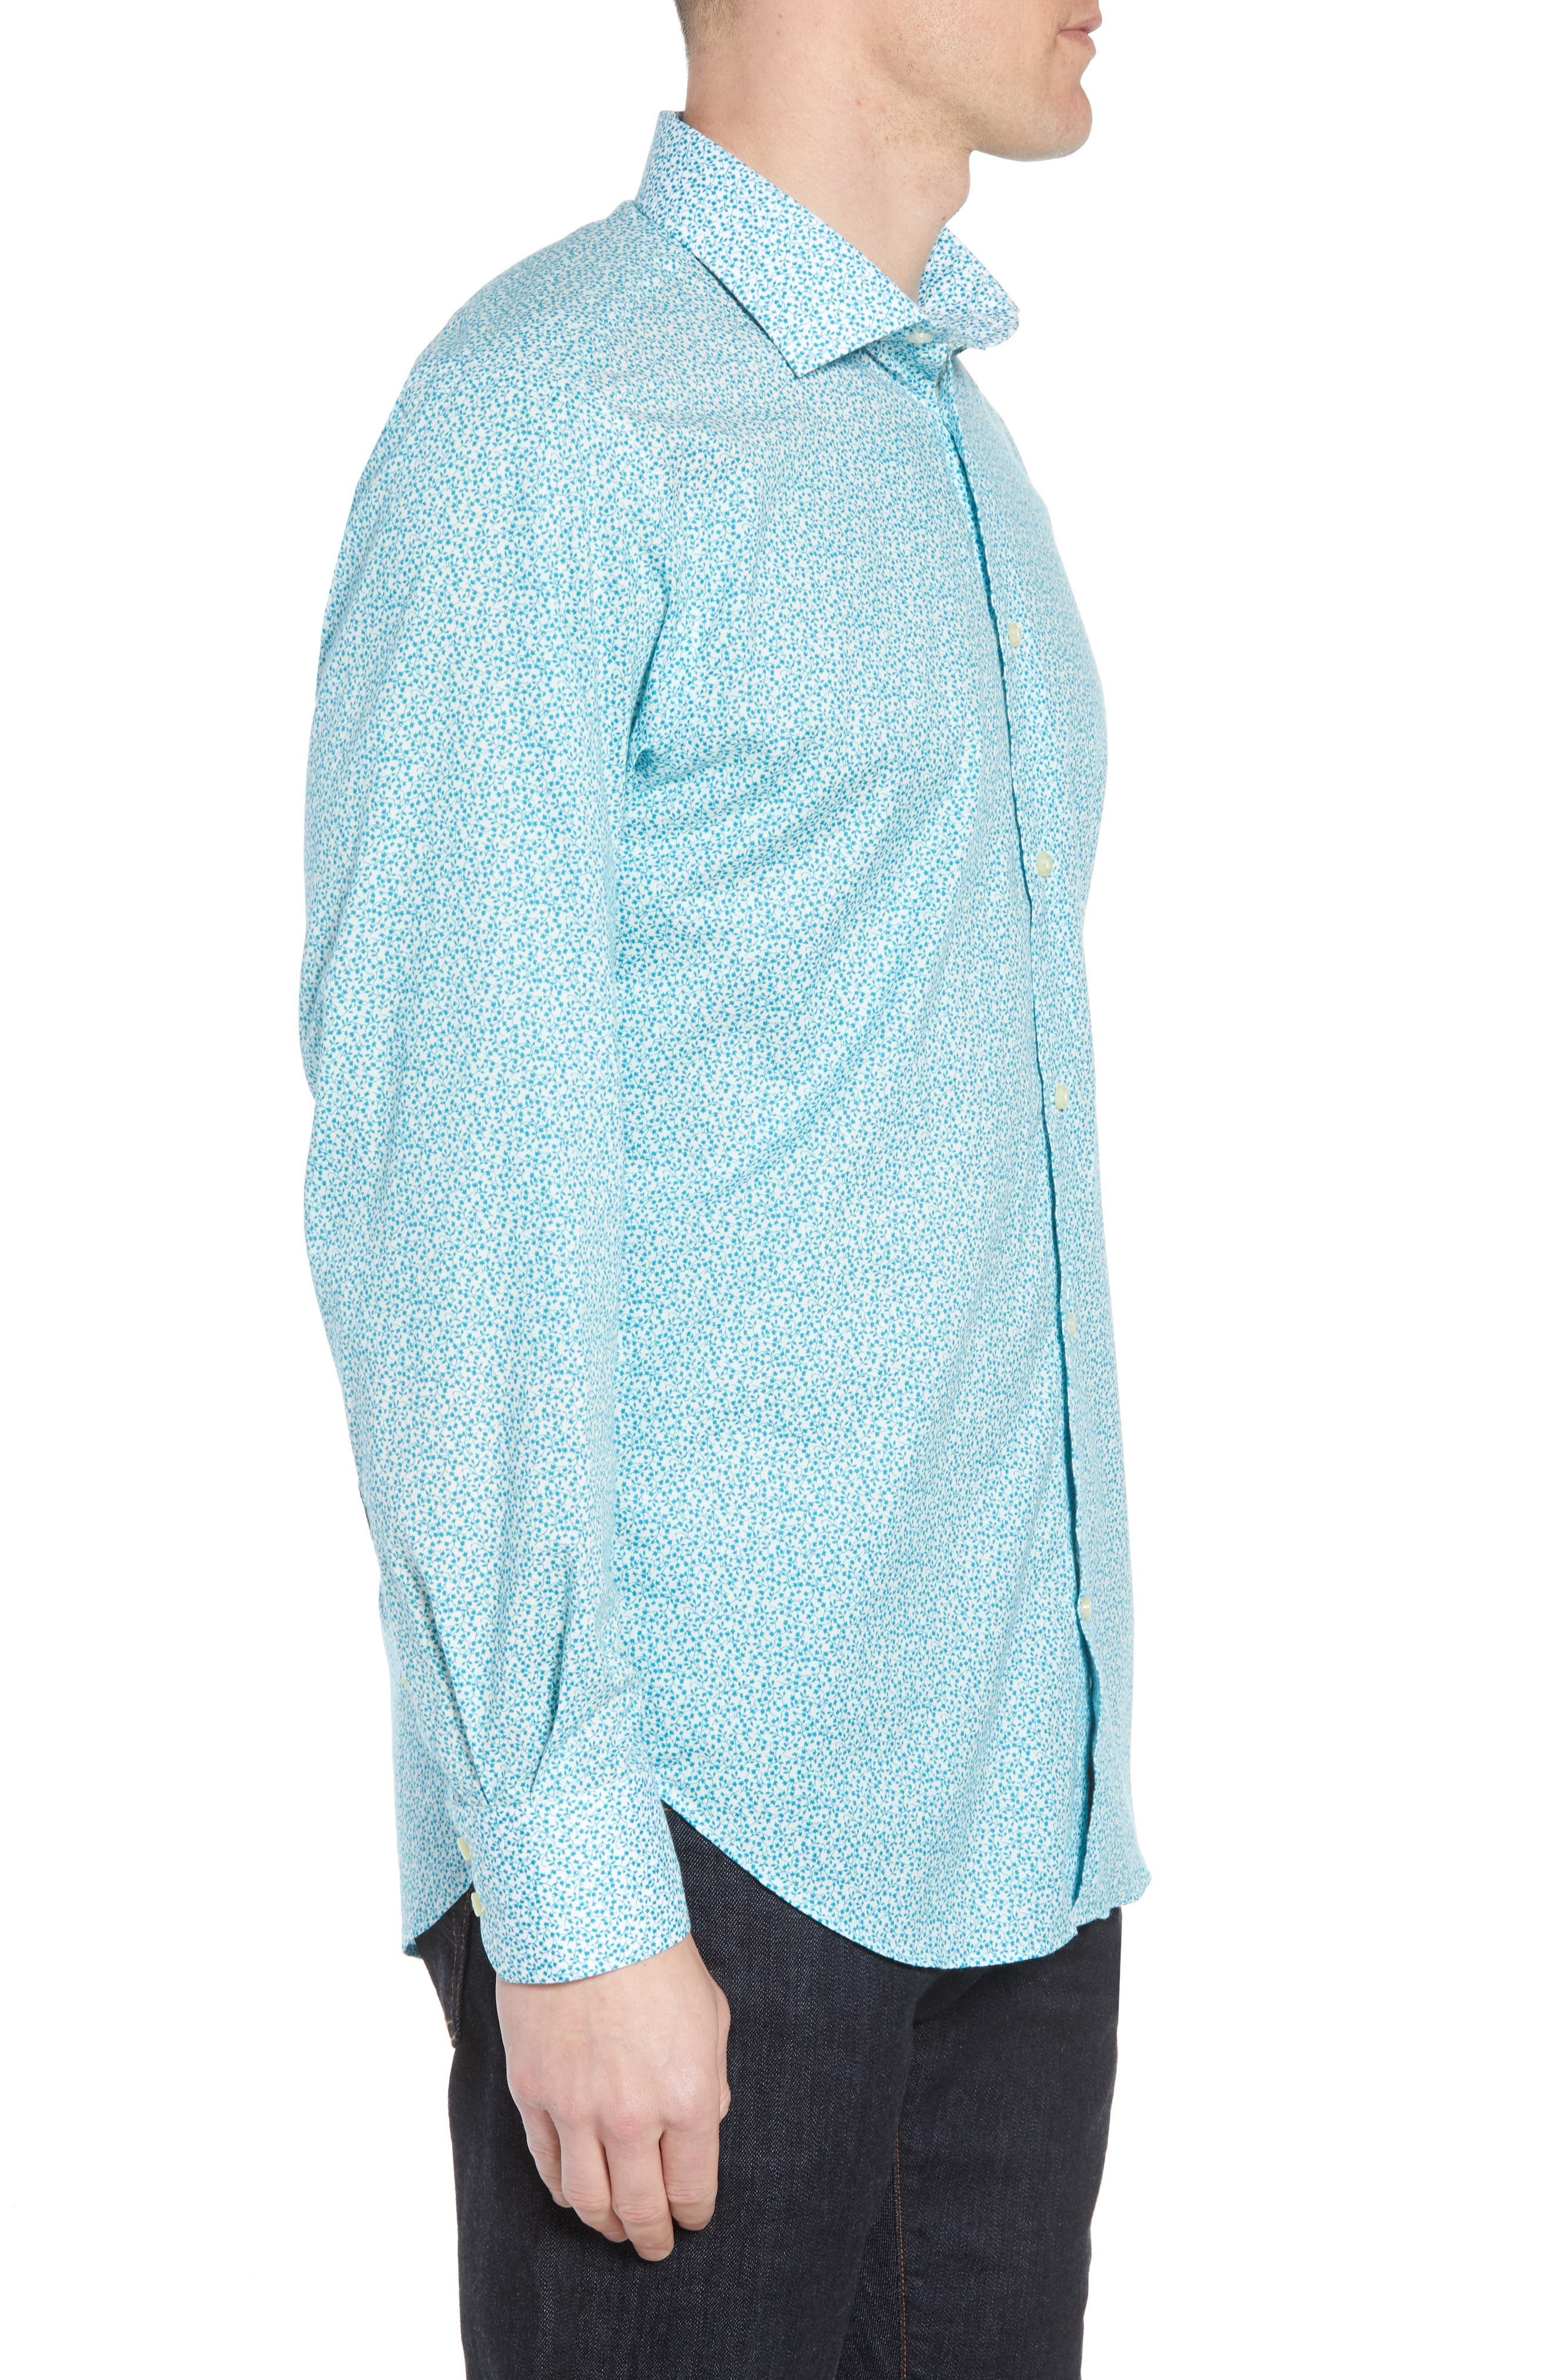 THOMAS DEAN,                             Regular Fit Floral Print Sport Shirt,                             Alternate thumbnail 3, color,                             300